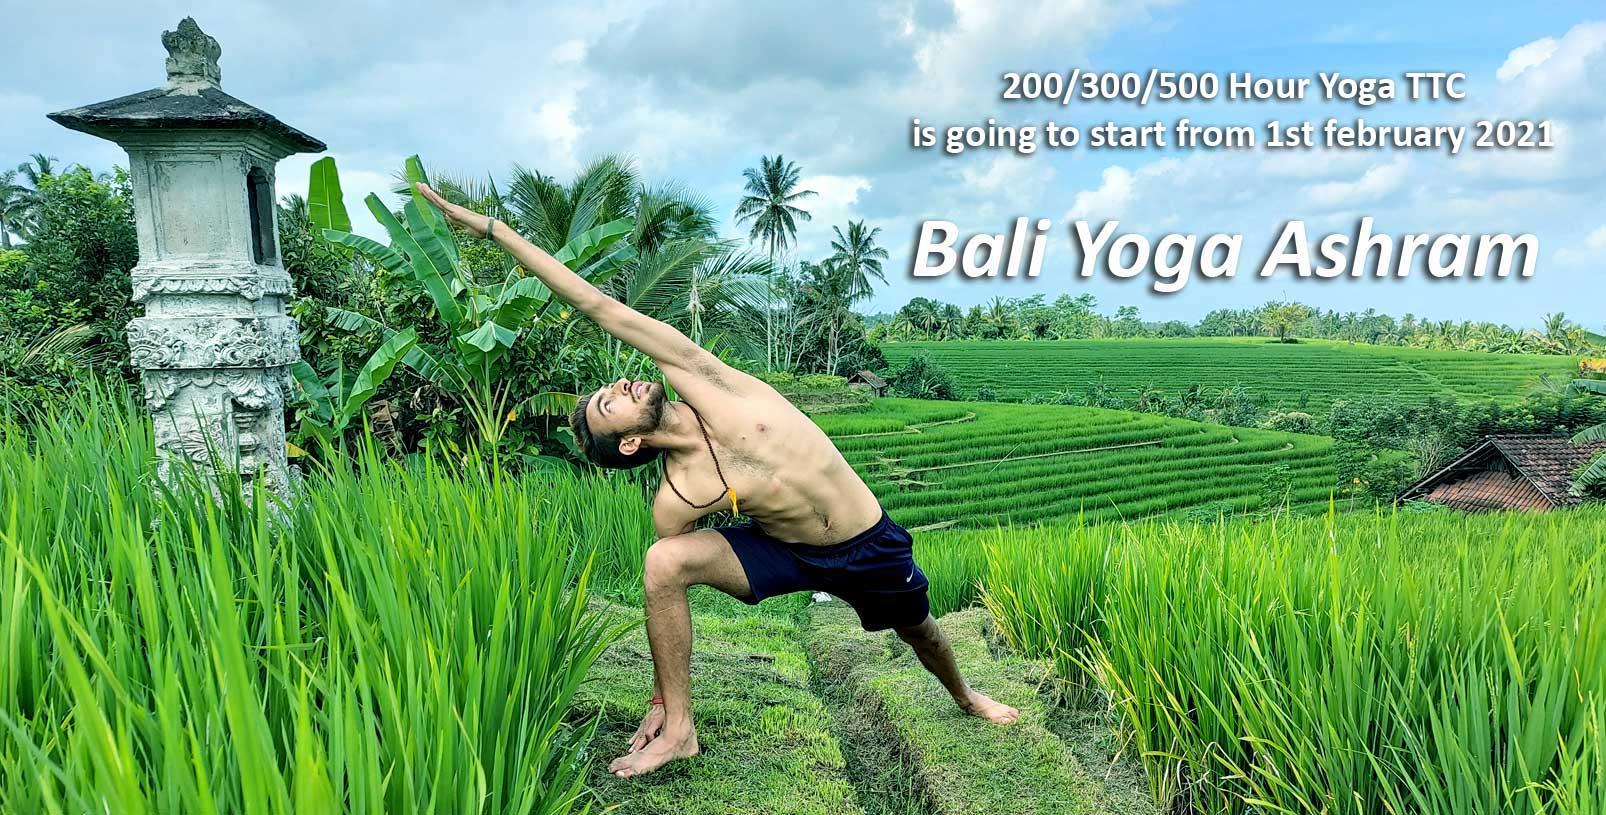 Bali Yoga Ashram Yoga Teacher Training In Bali 2020 Accredited Yoga Teacher Training Indonesia Advanced Teacher Training Yoga Advanced Teacher Training Yoga Indonesia Advanced Yoga Teacher Training